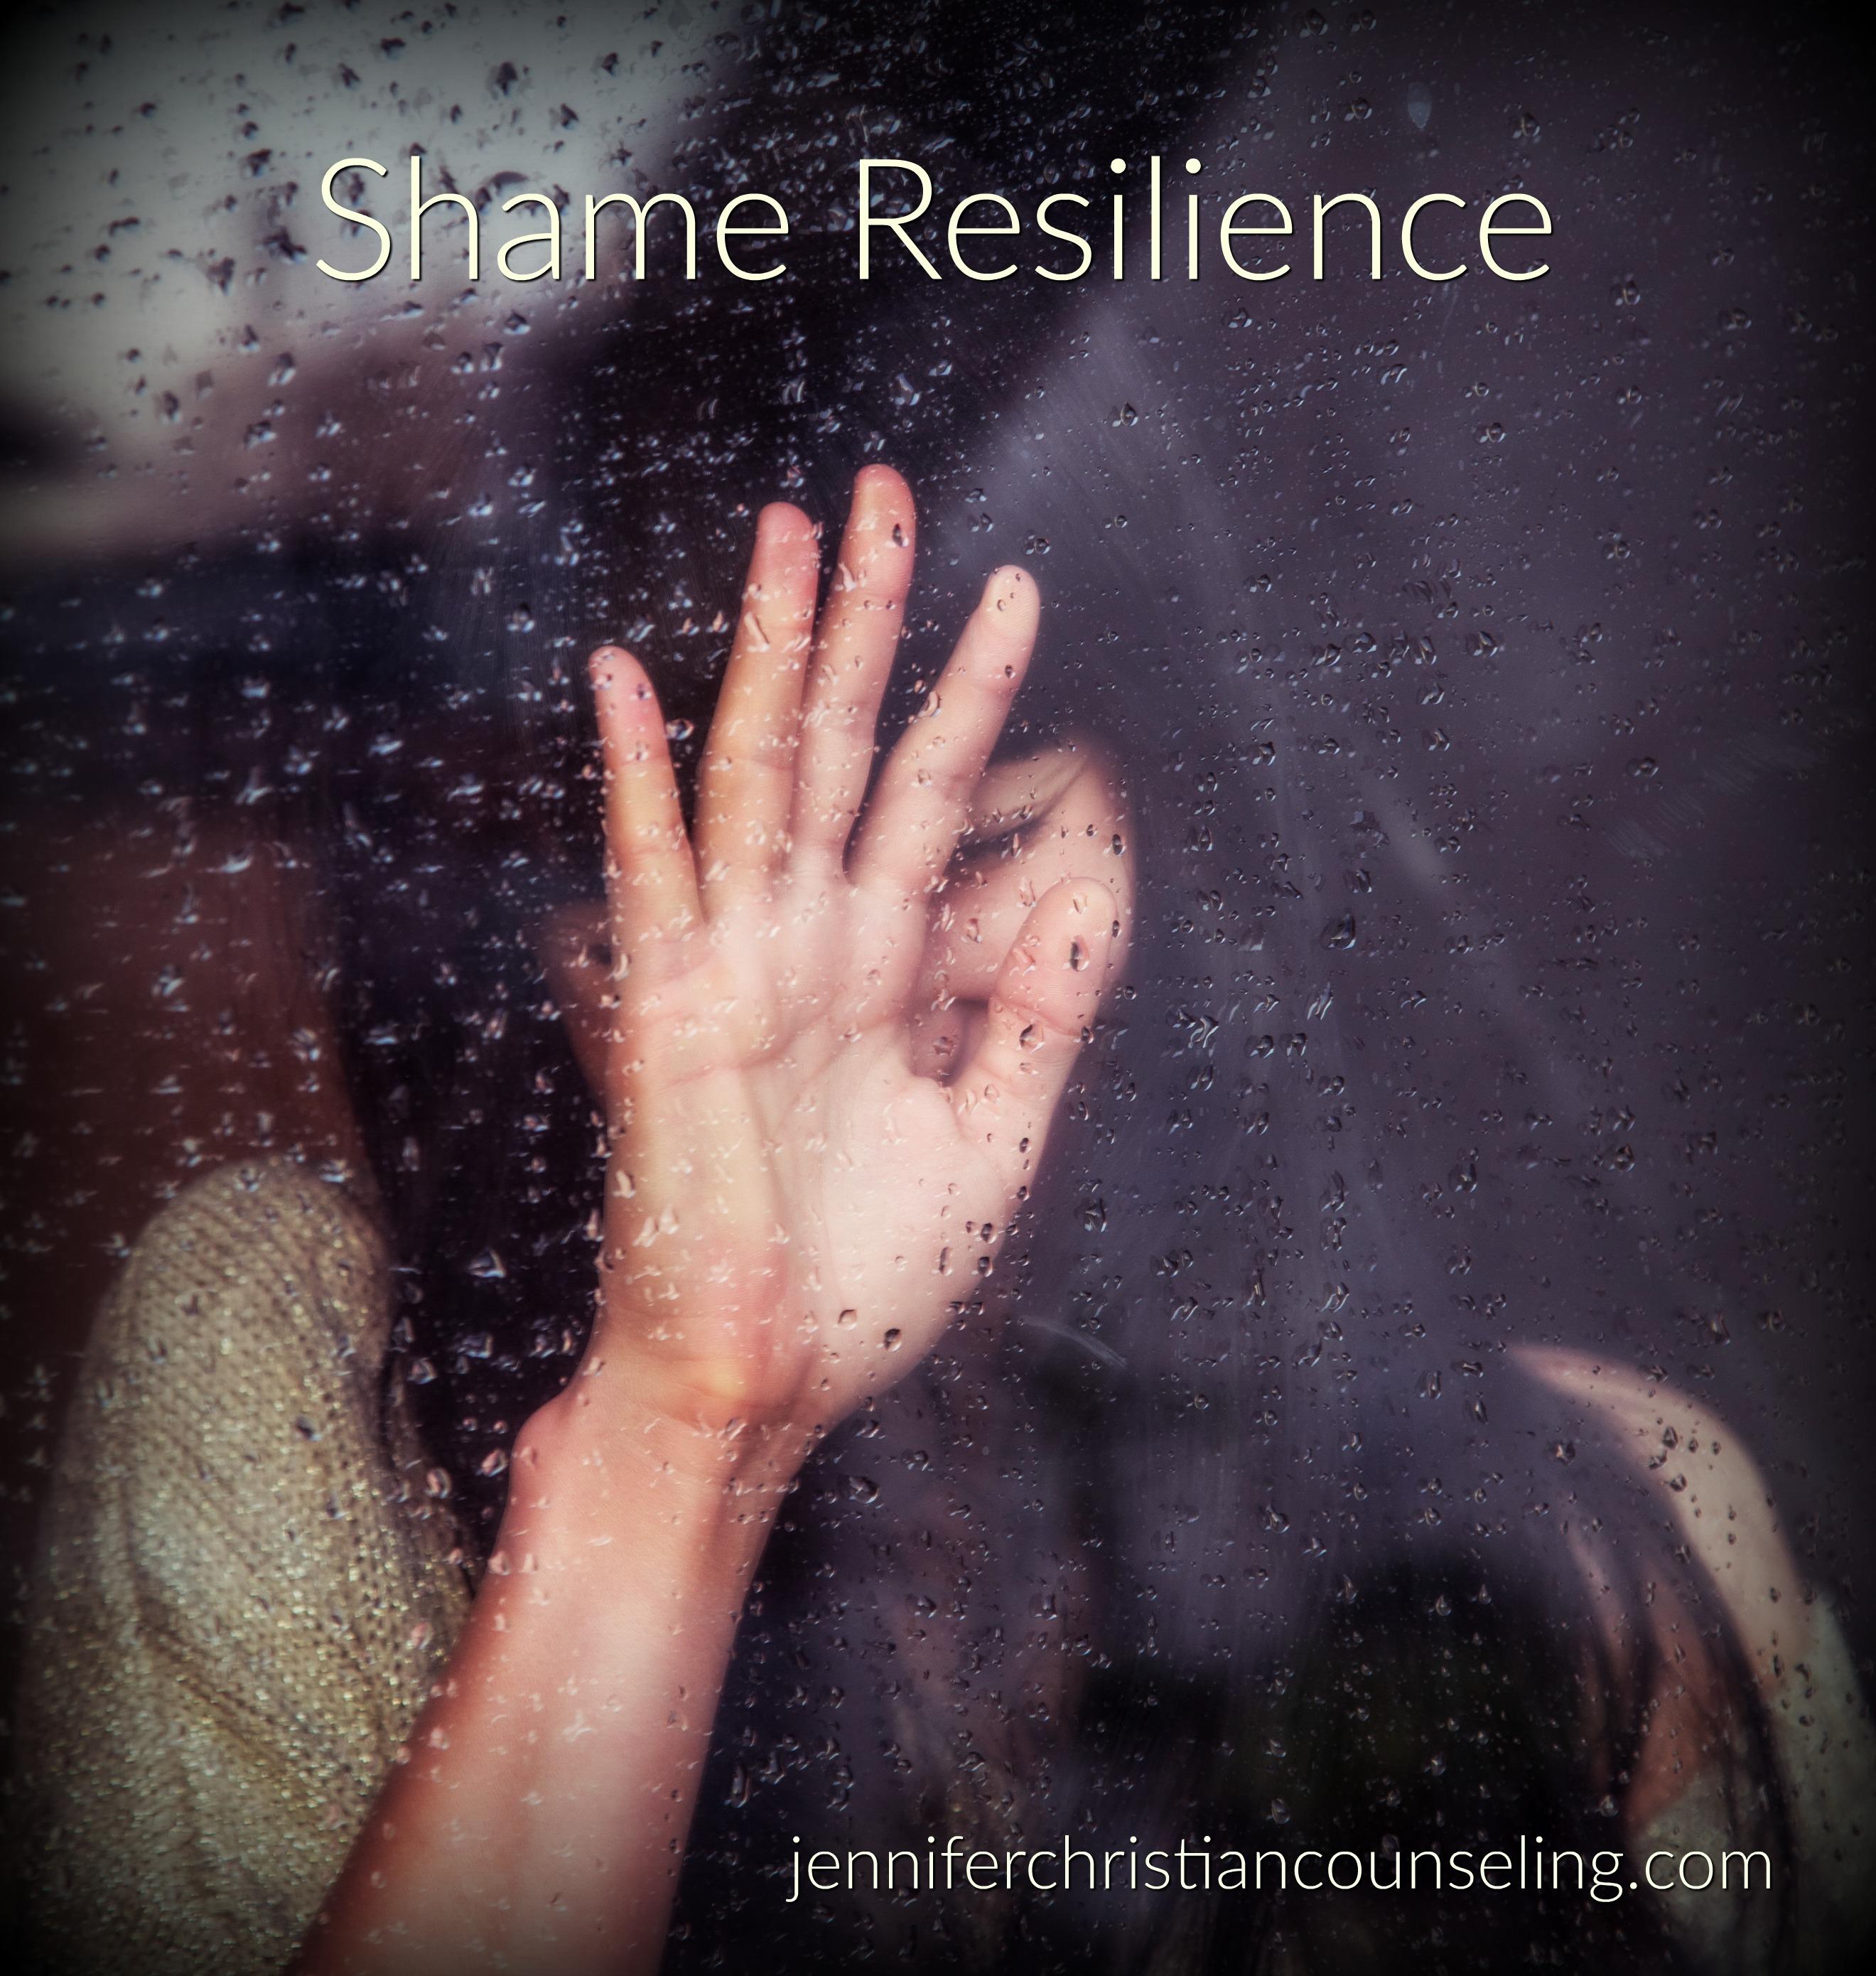 Shame Resilience